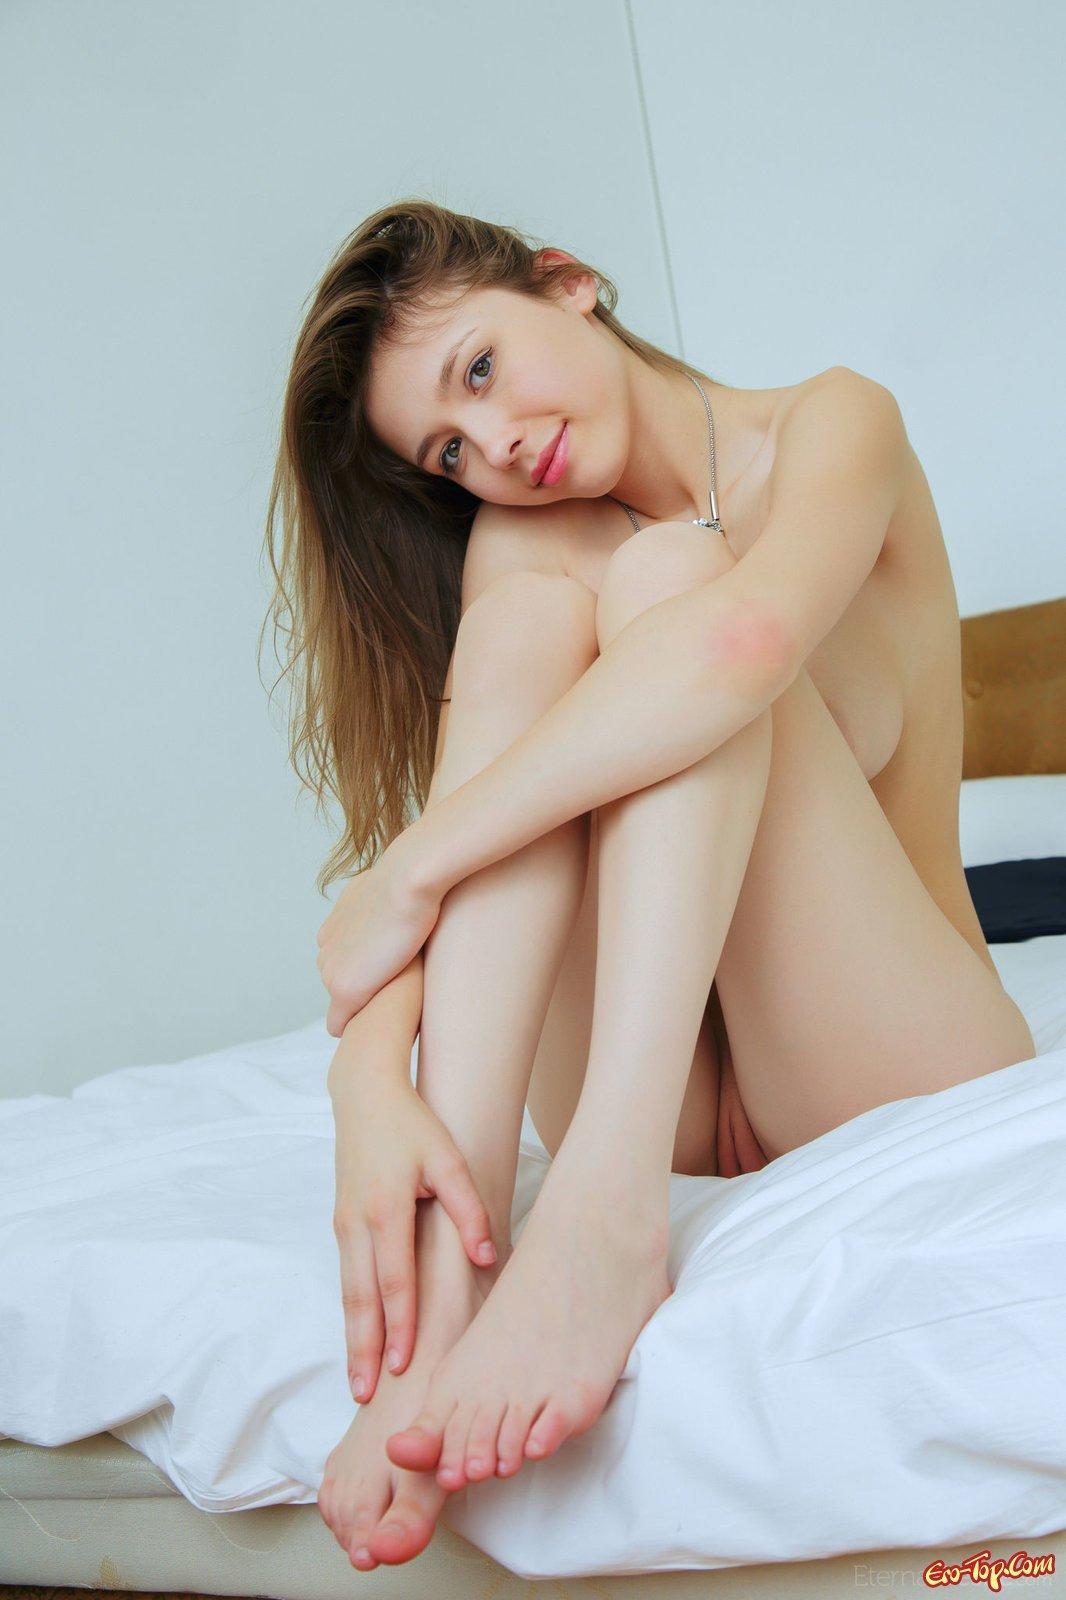 Девушка с висячими сиськами сняла трусики в постели